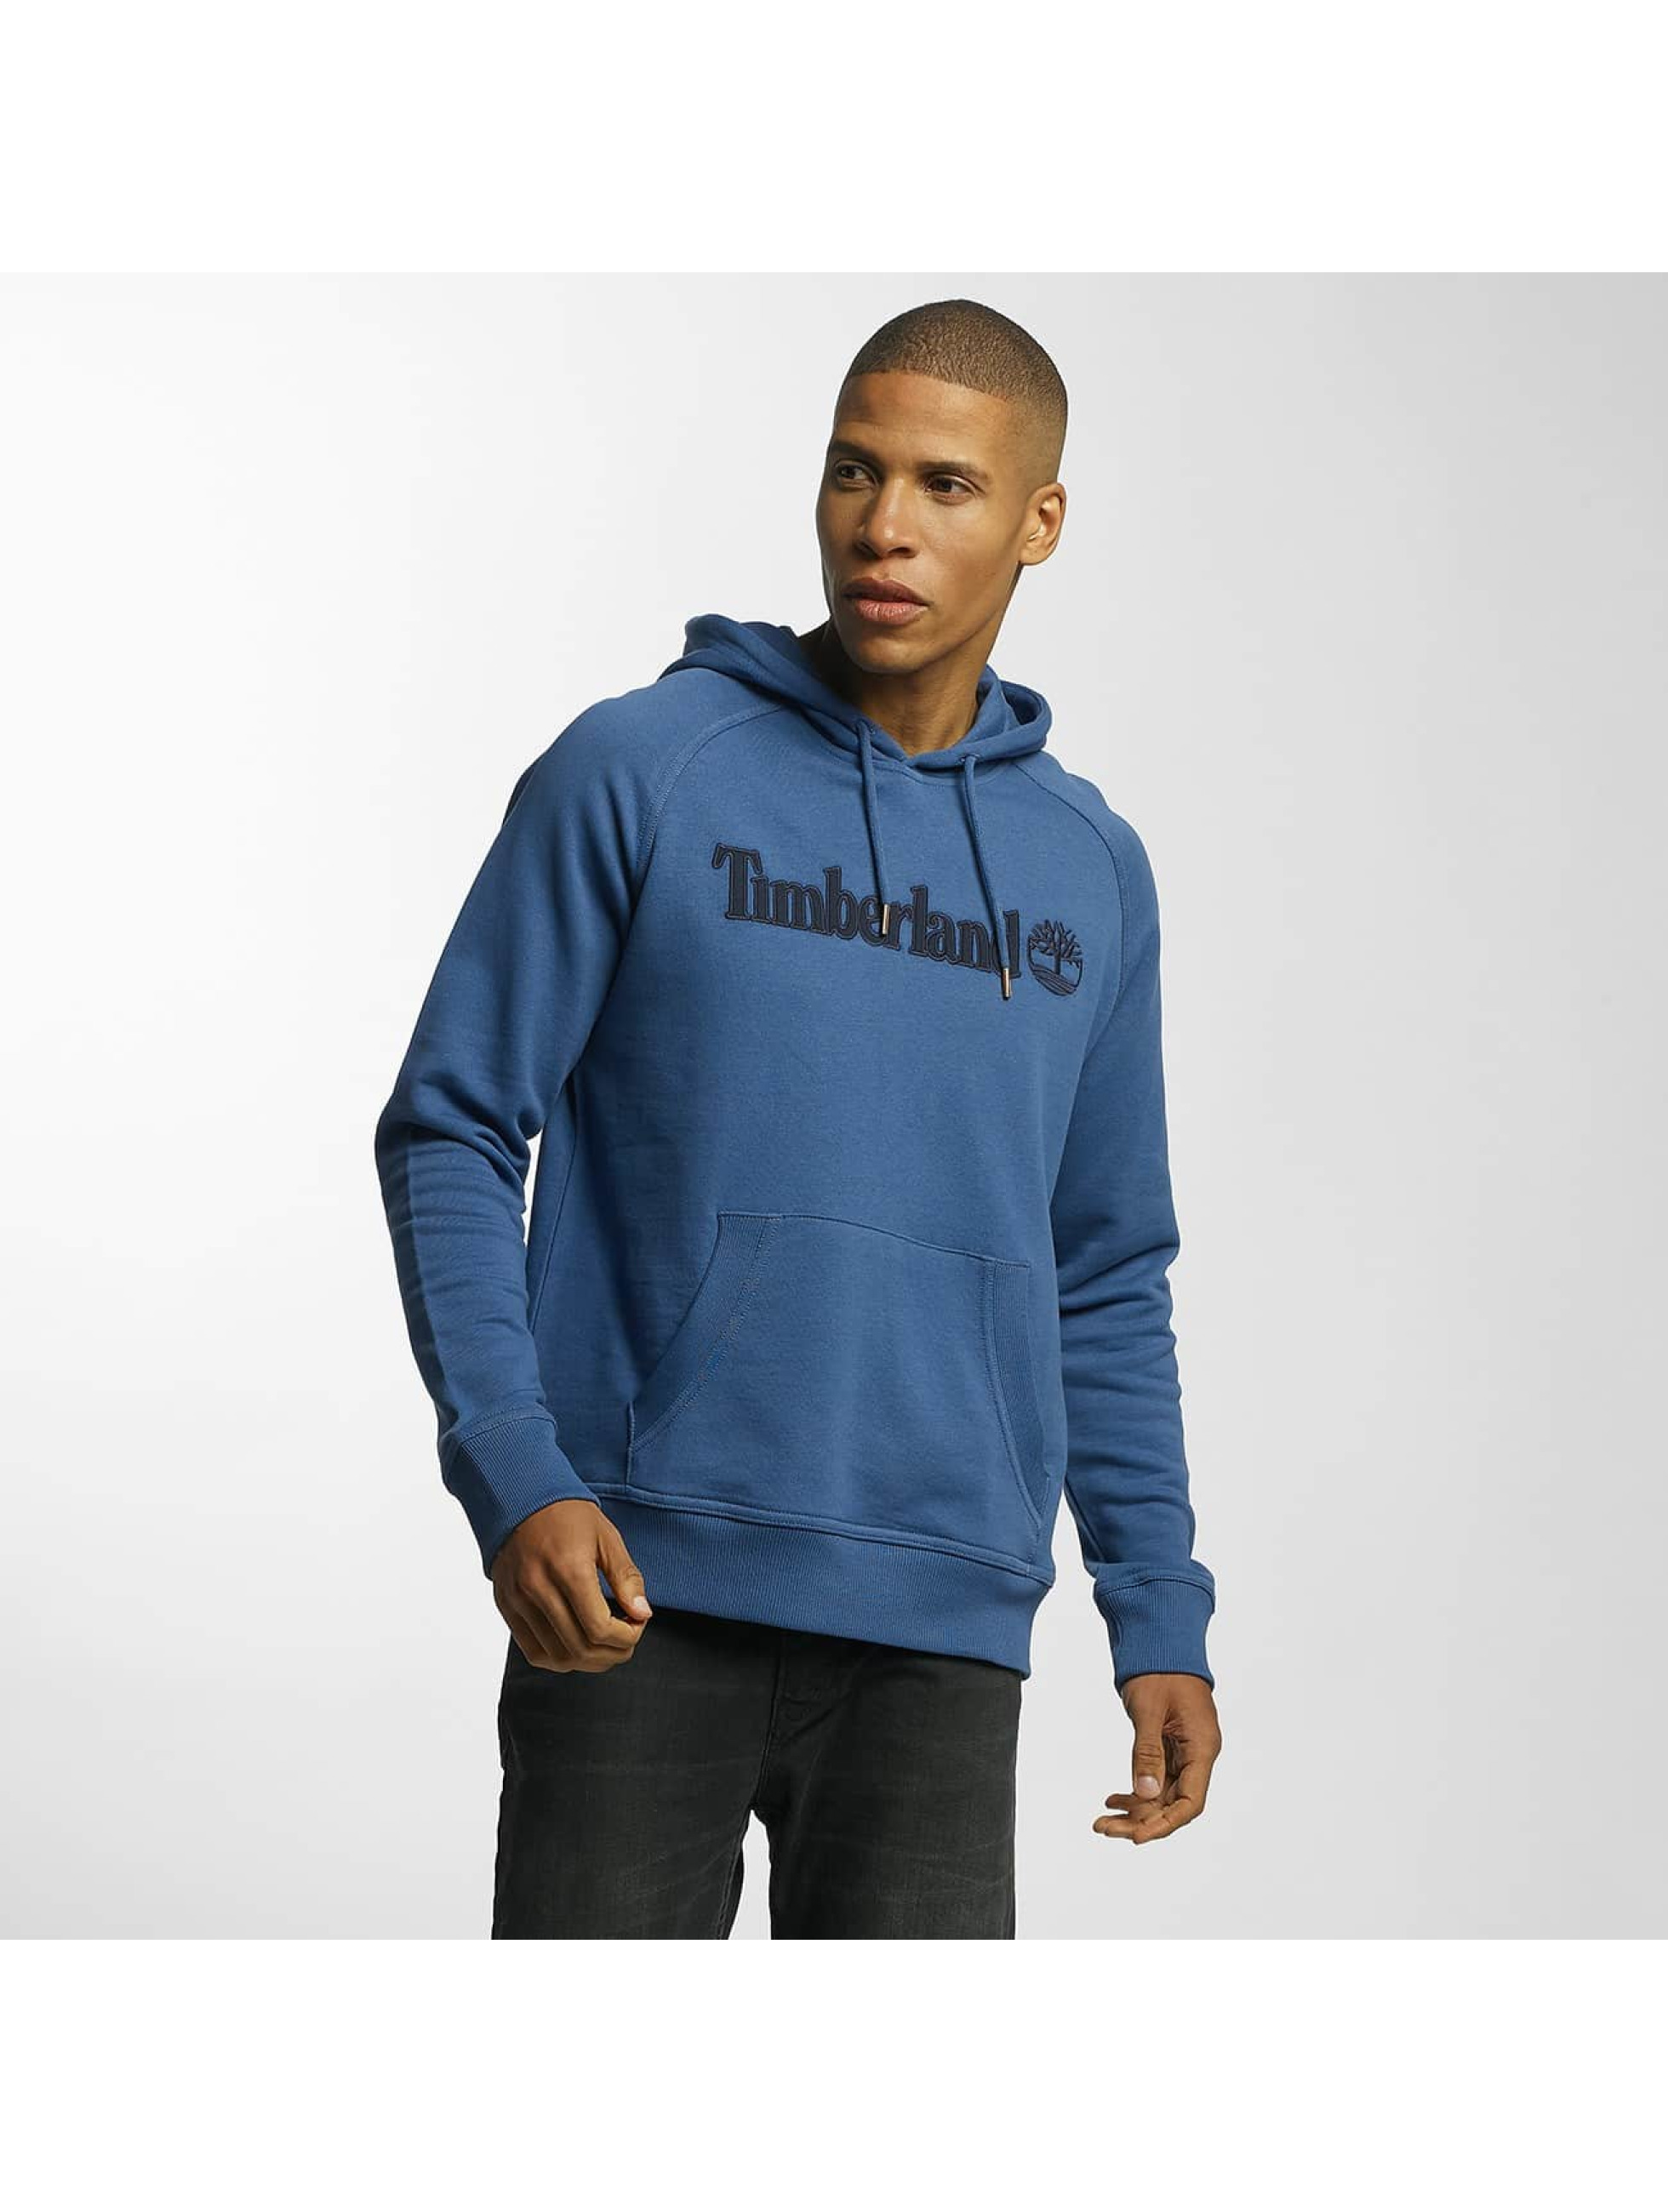 Timberland Hoody Graph blau